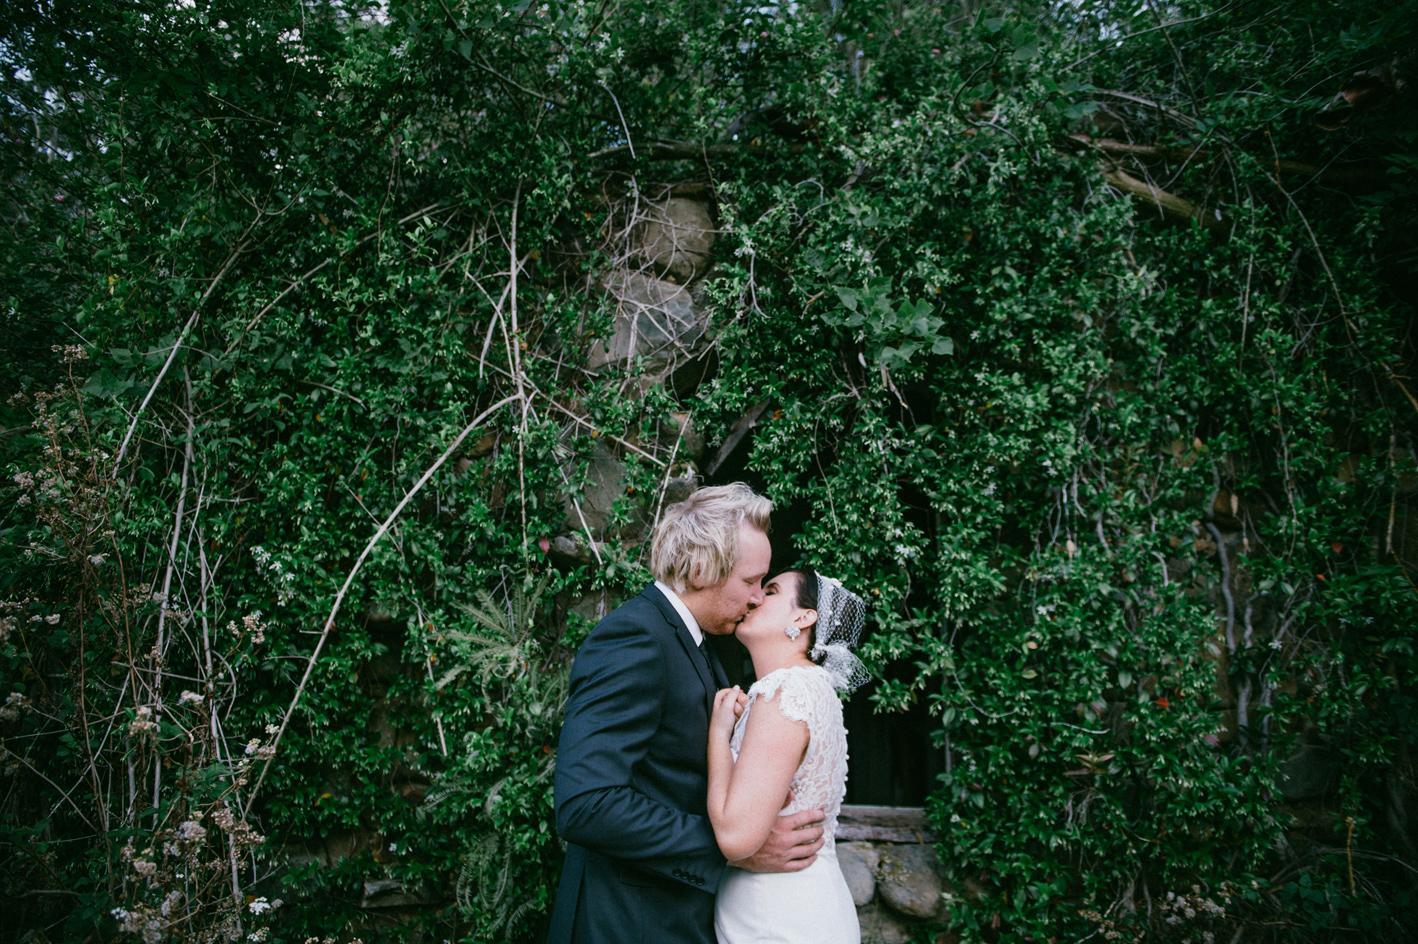 078-hannah-daniel-boomerang-farm-wedding-sophie-baker-photography